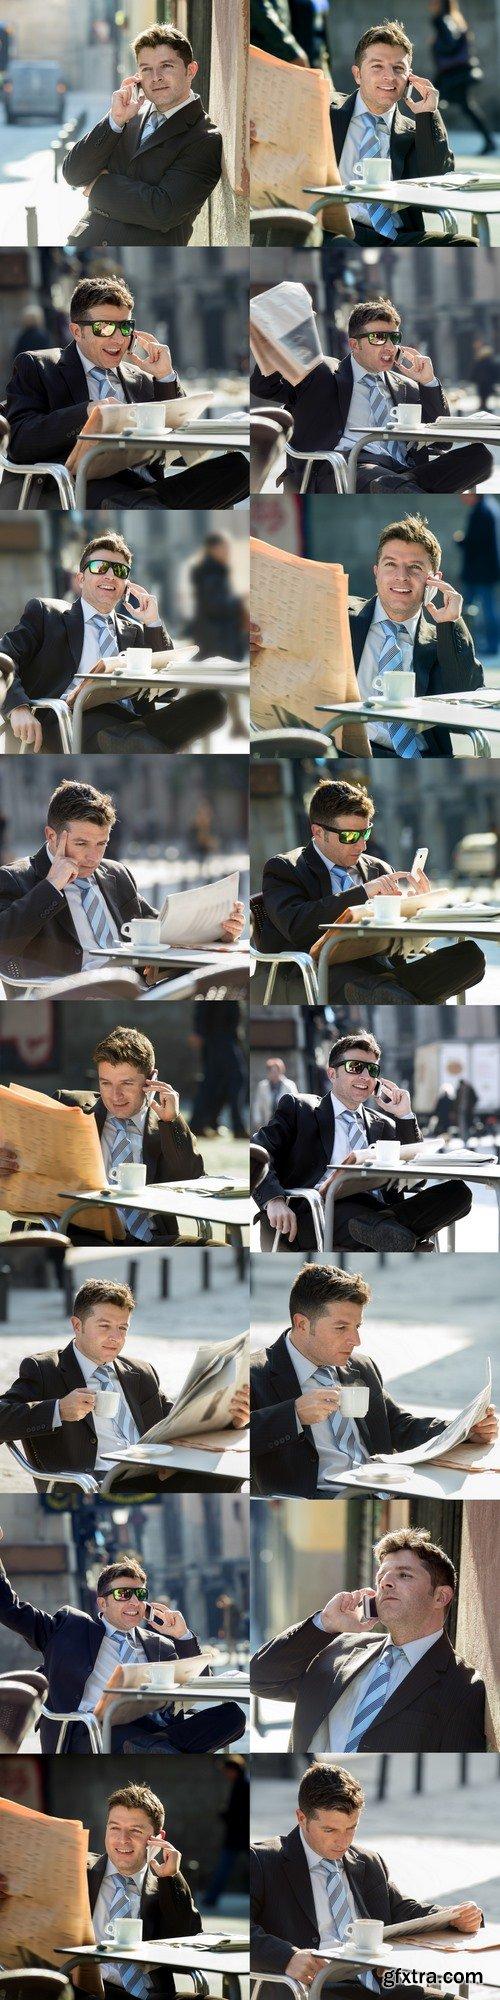 Businessman in caffe